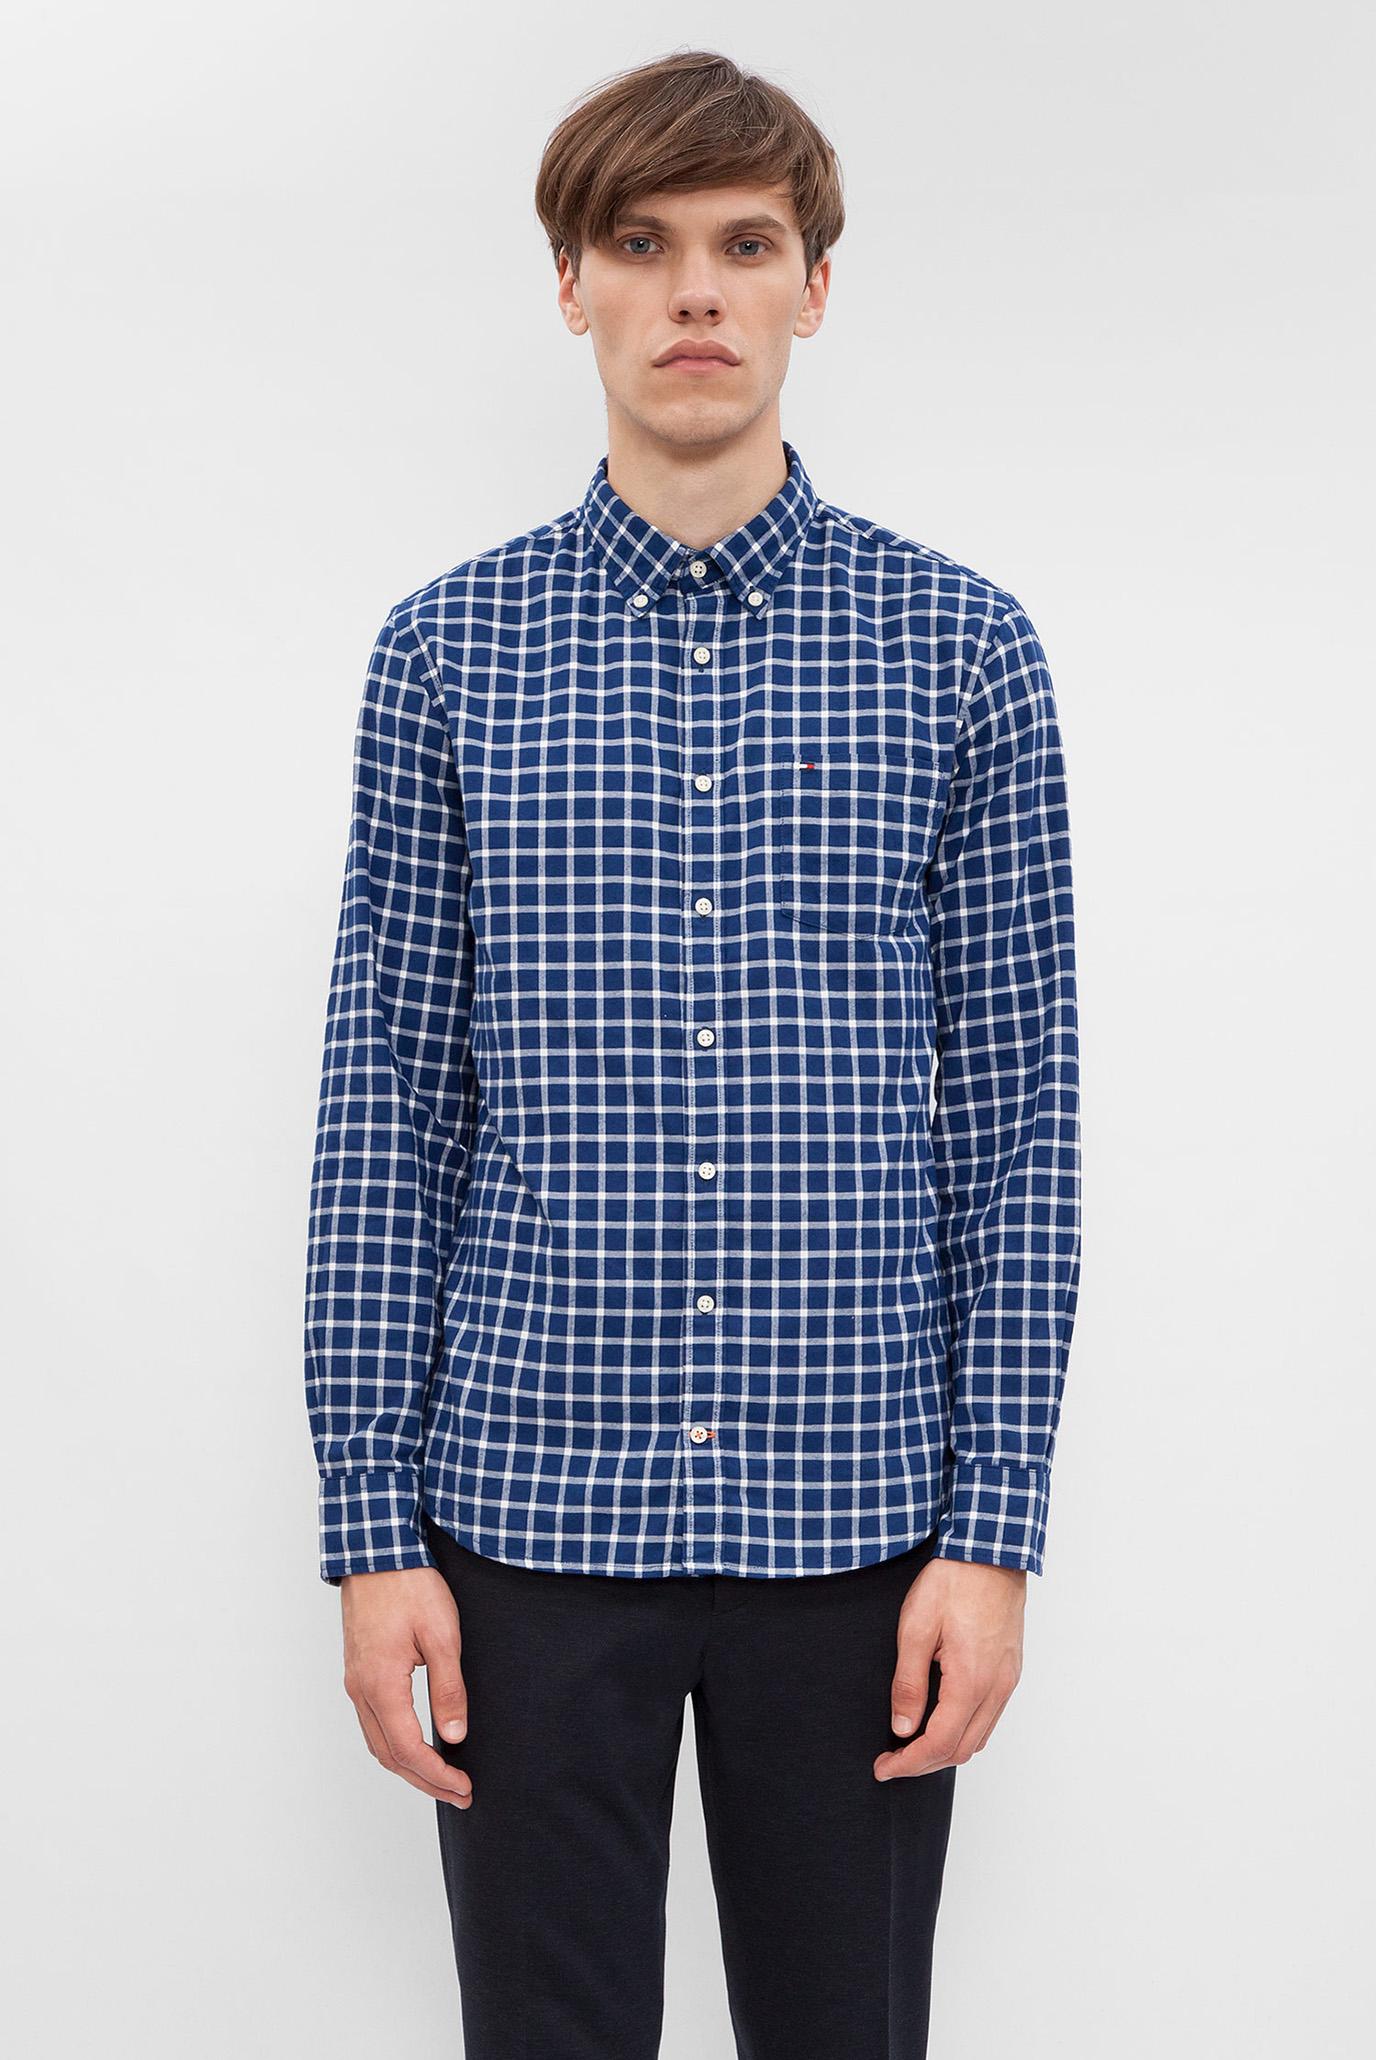 ec119139b65 Купить Мужская синяя рубашка в клетку Tommy Hilfiger Tommy Hilfiger  MW0MW03041 – Киев